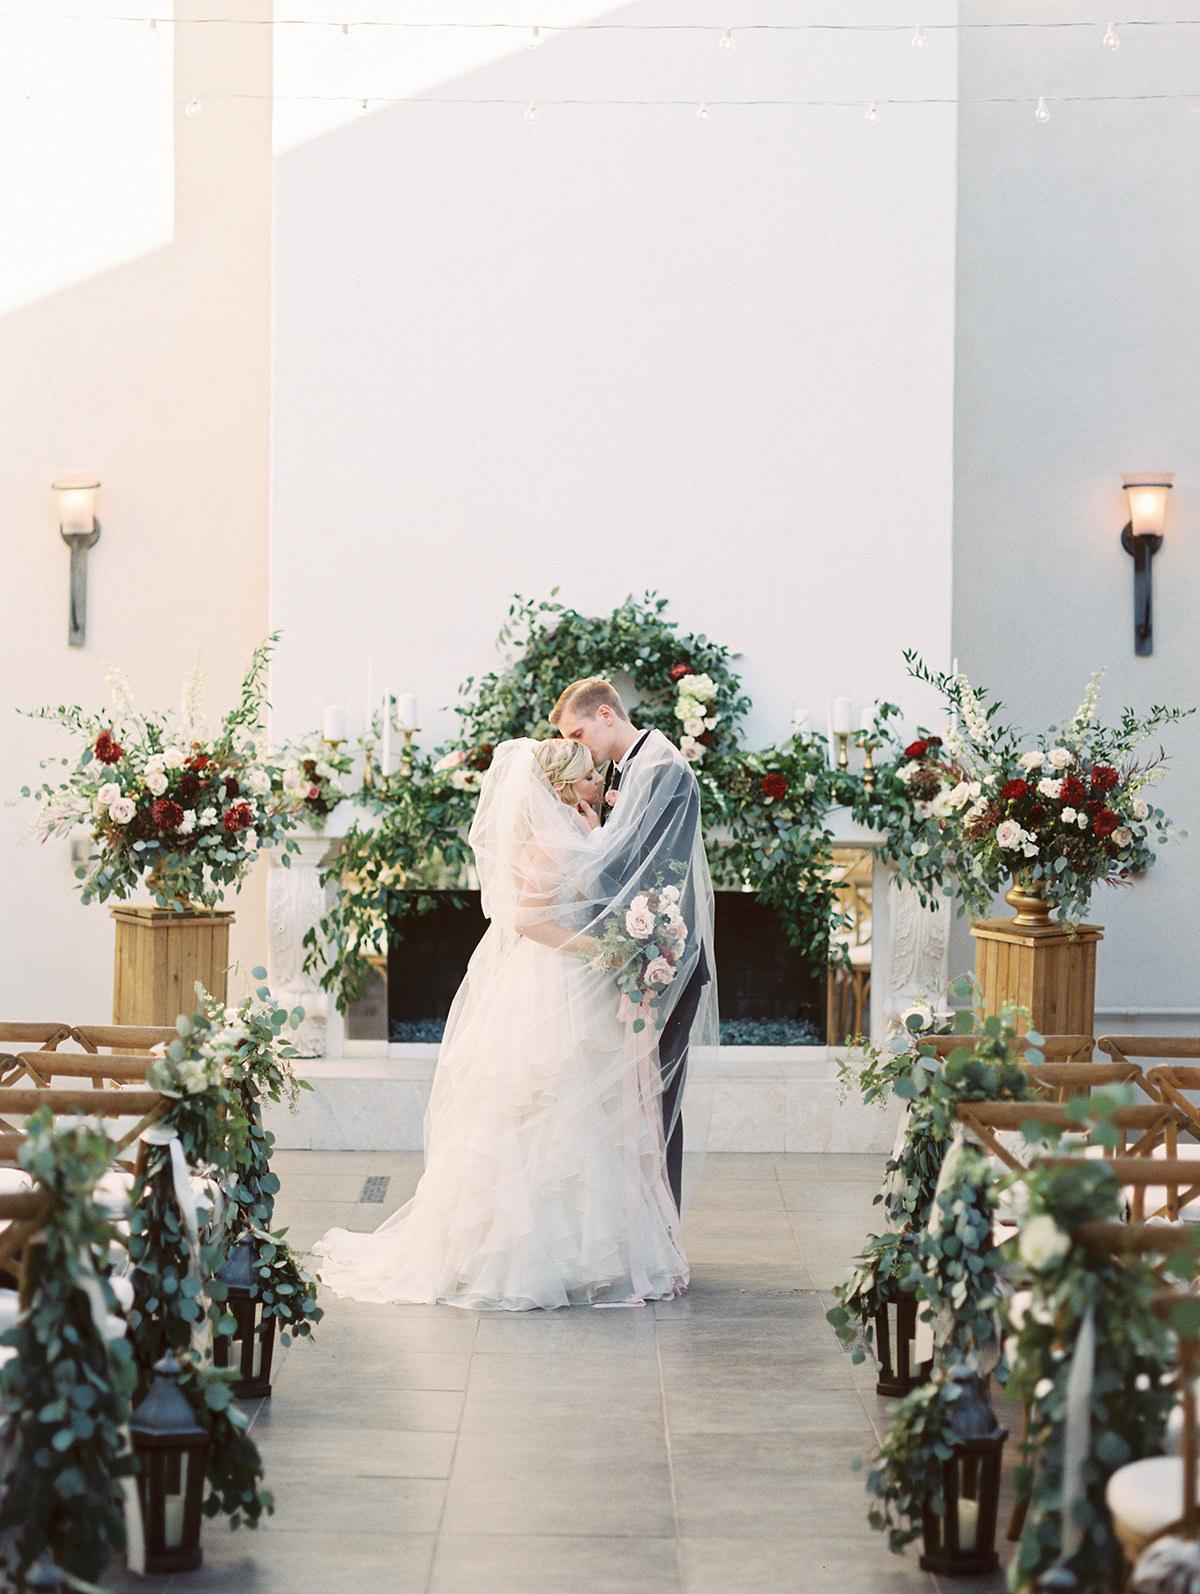 secret garden romantic wedding ceremony- photo Charity Maurer https://ruffledblog.com/stylish-arizona-wedding-with-secret-garden-vibes